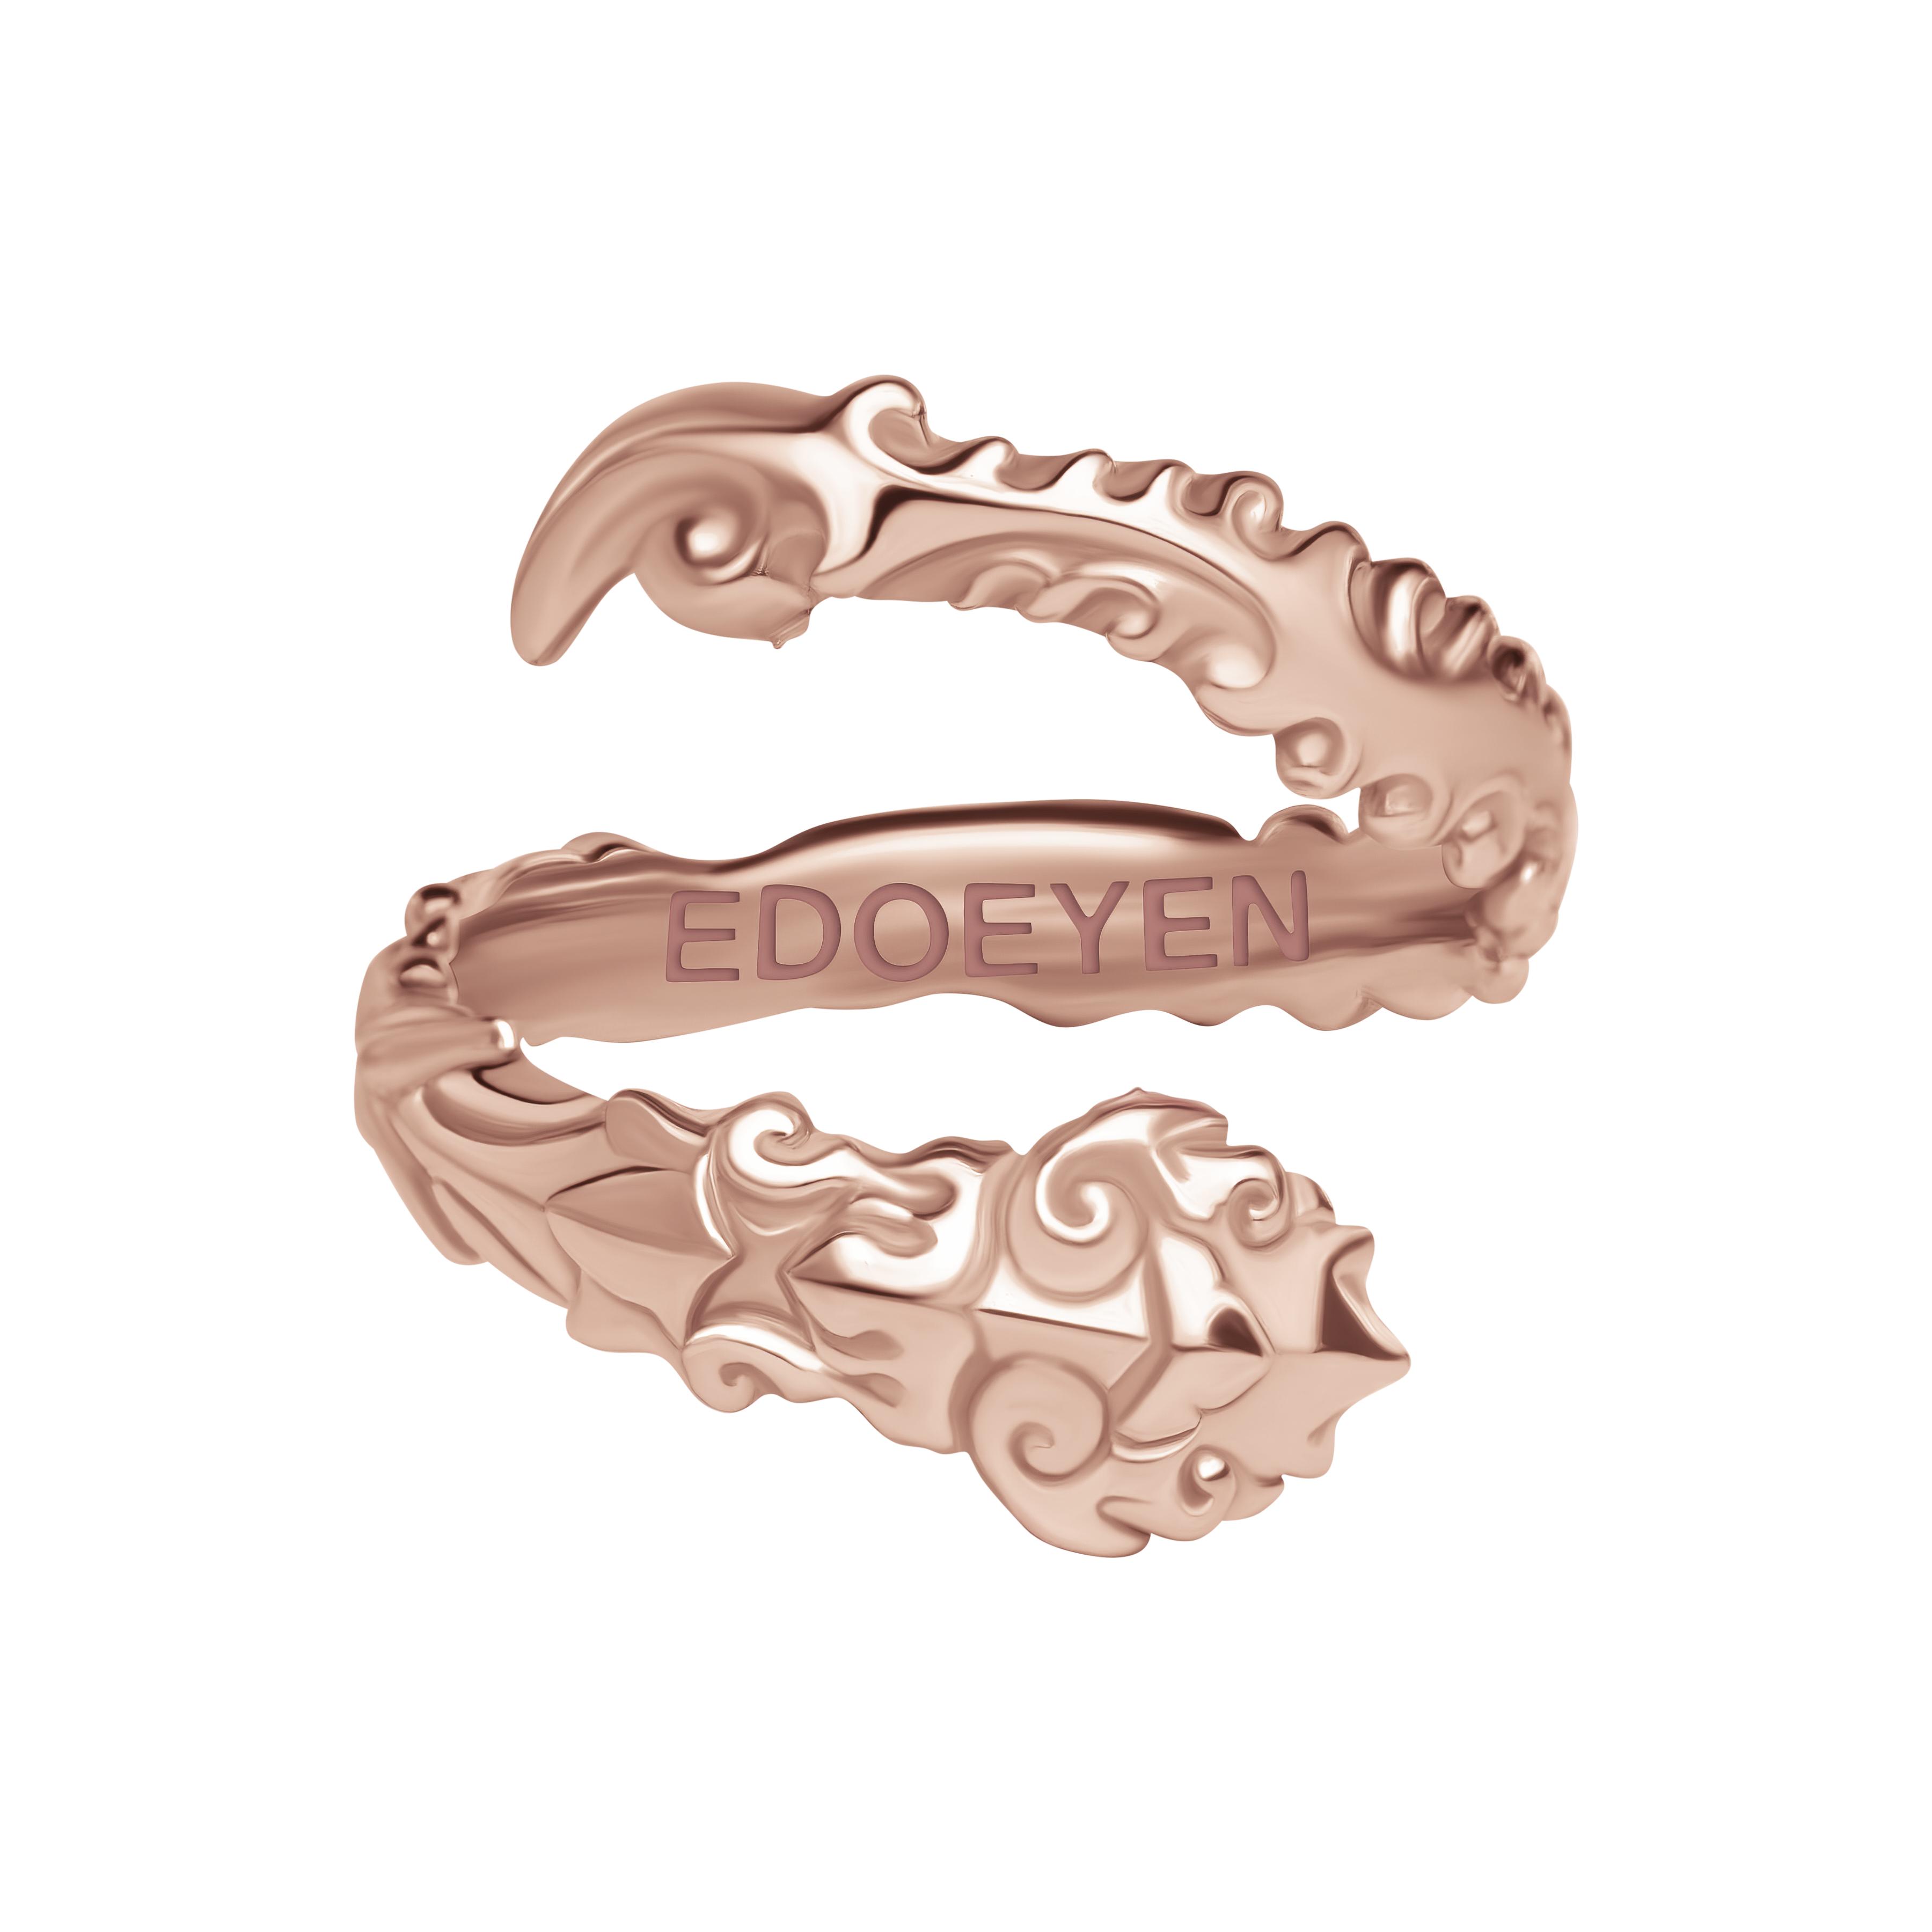 Aroubei Ring in 18kt Rose Gold, Image Courtesy of EdoEyen